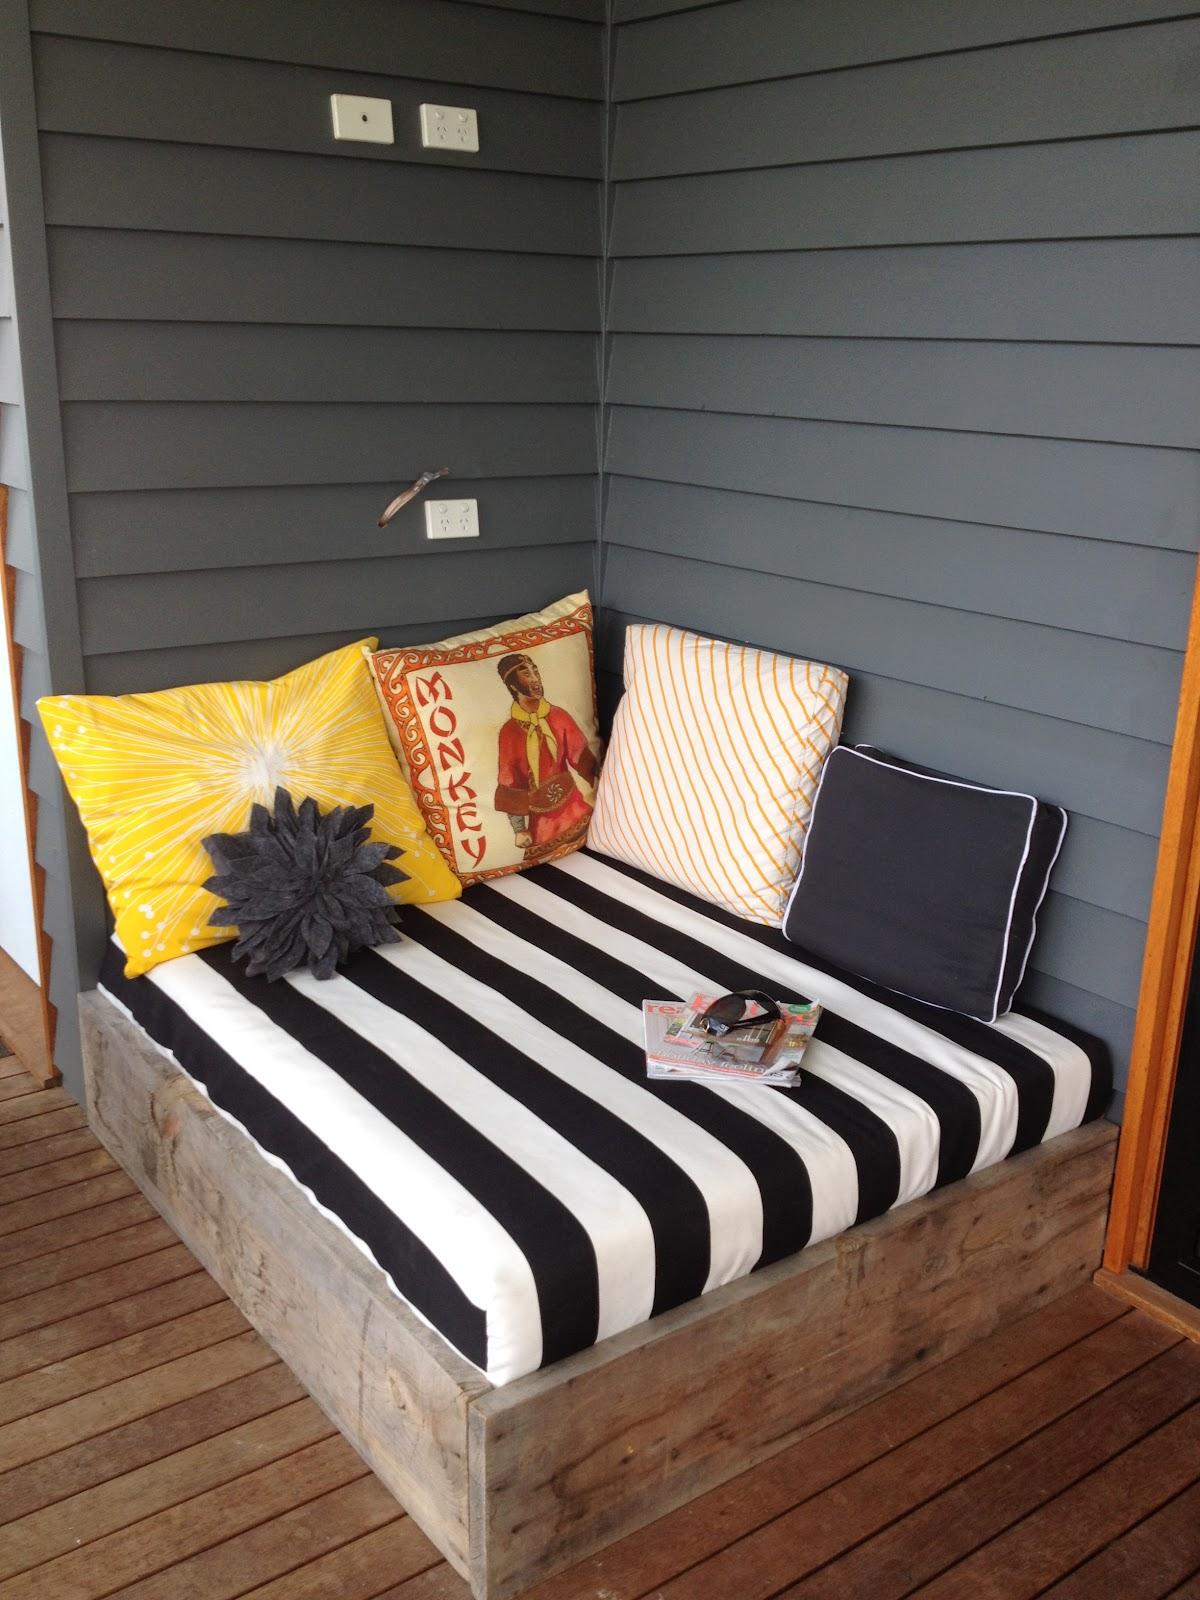 DIY Home Projects - Backyard Ideas | The 36th AVENUE on Diy Garden Patio Ideas id=57452